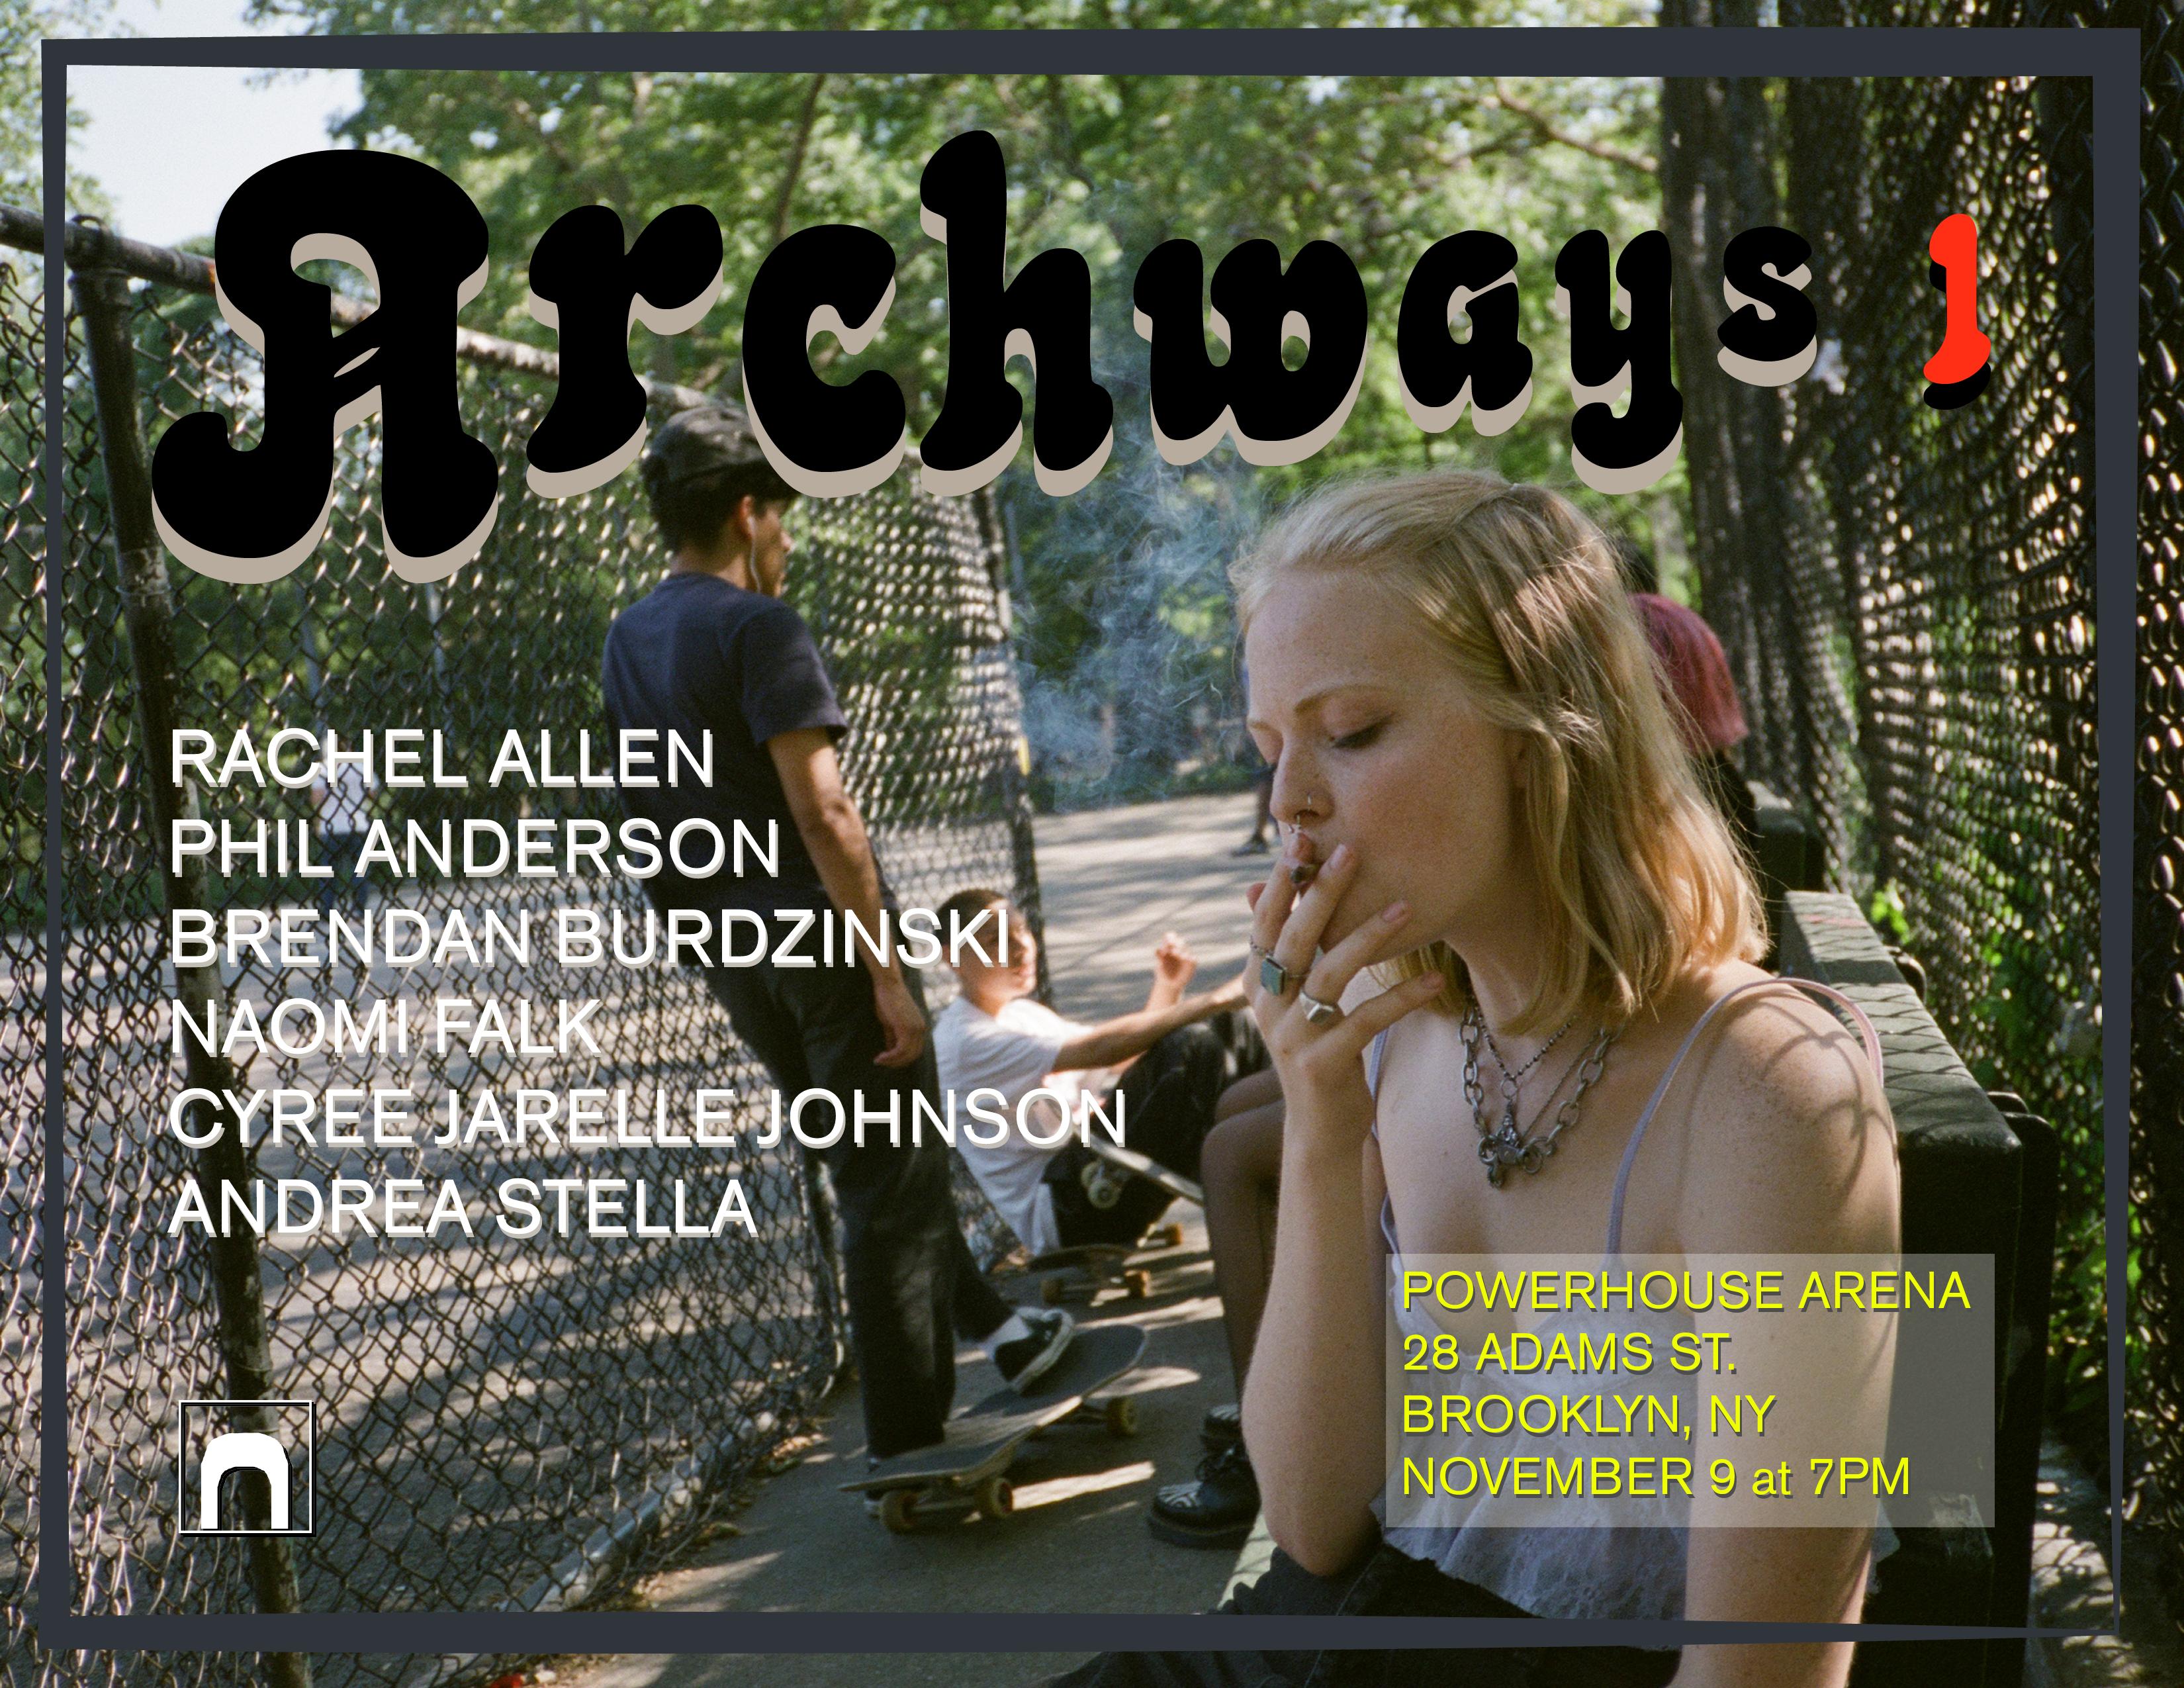 Archways 1 featuring Rachel Allen, Phil Anderson, Brendan Burdzinski, Naomi Falk, Cyree Jarelle Johnson and Andrea Stella